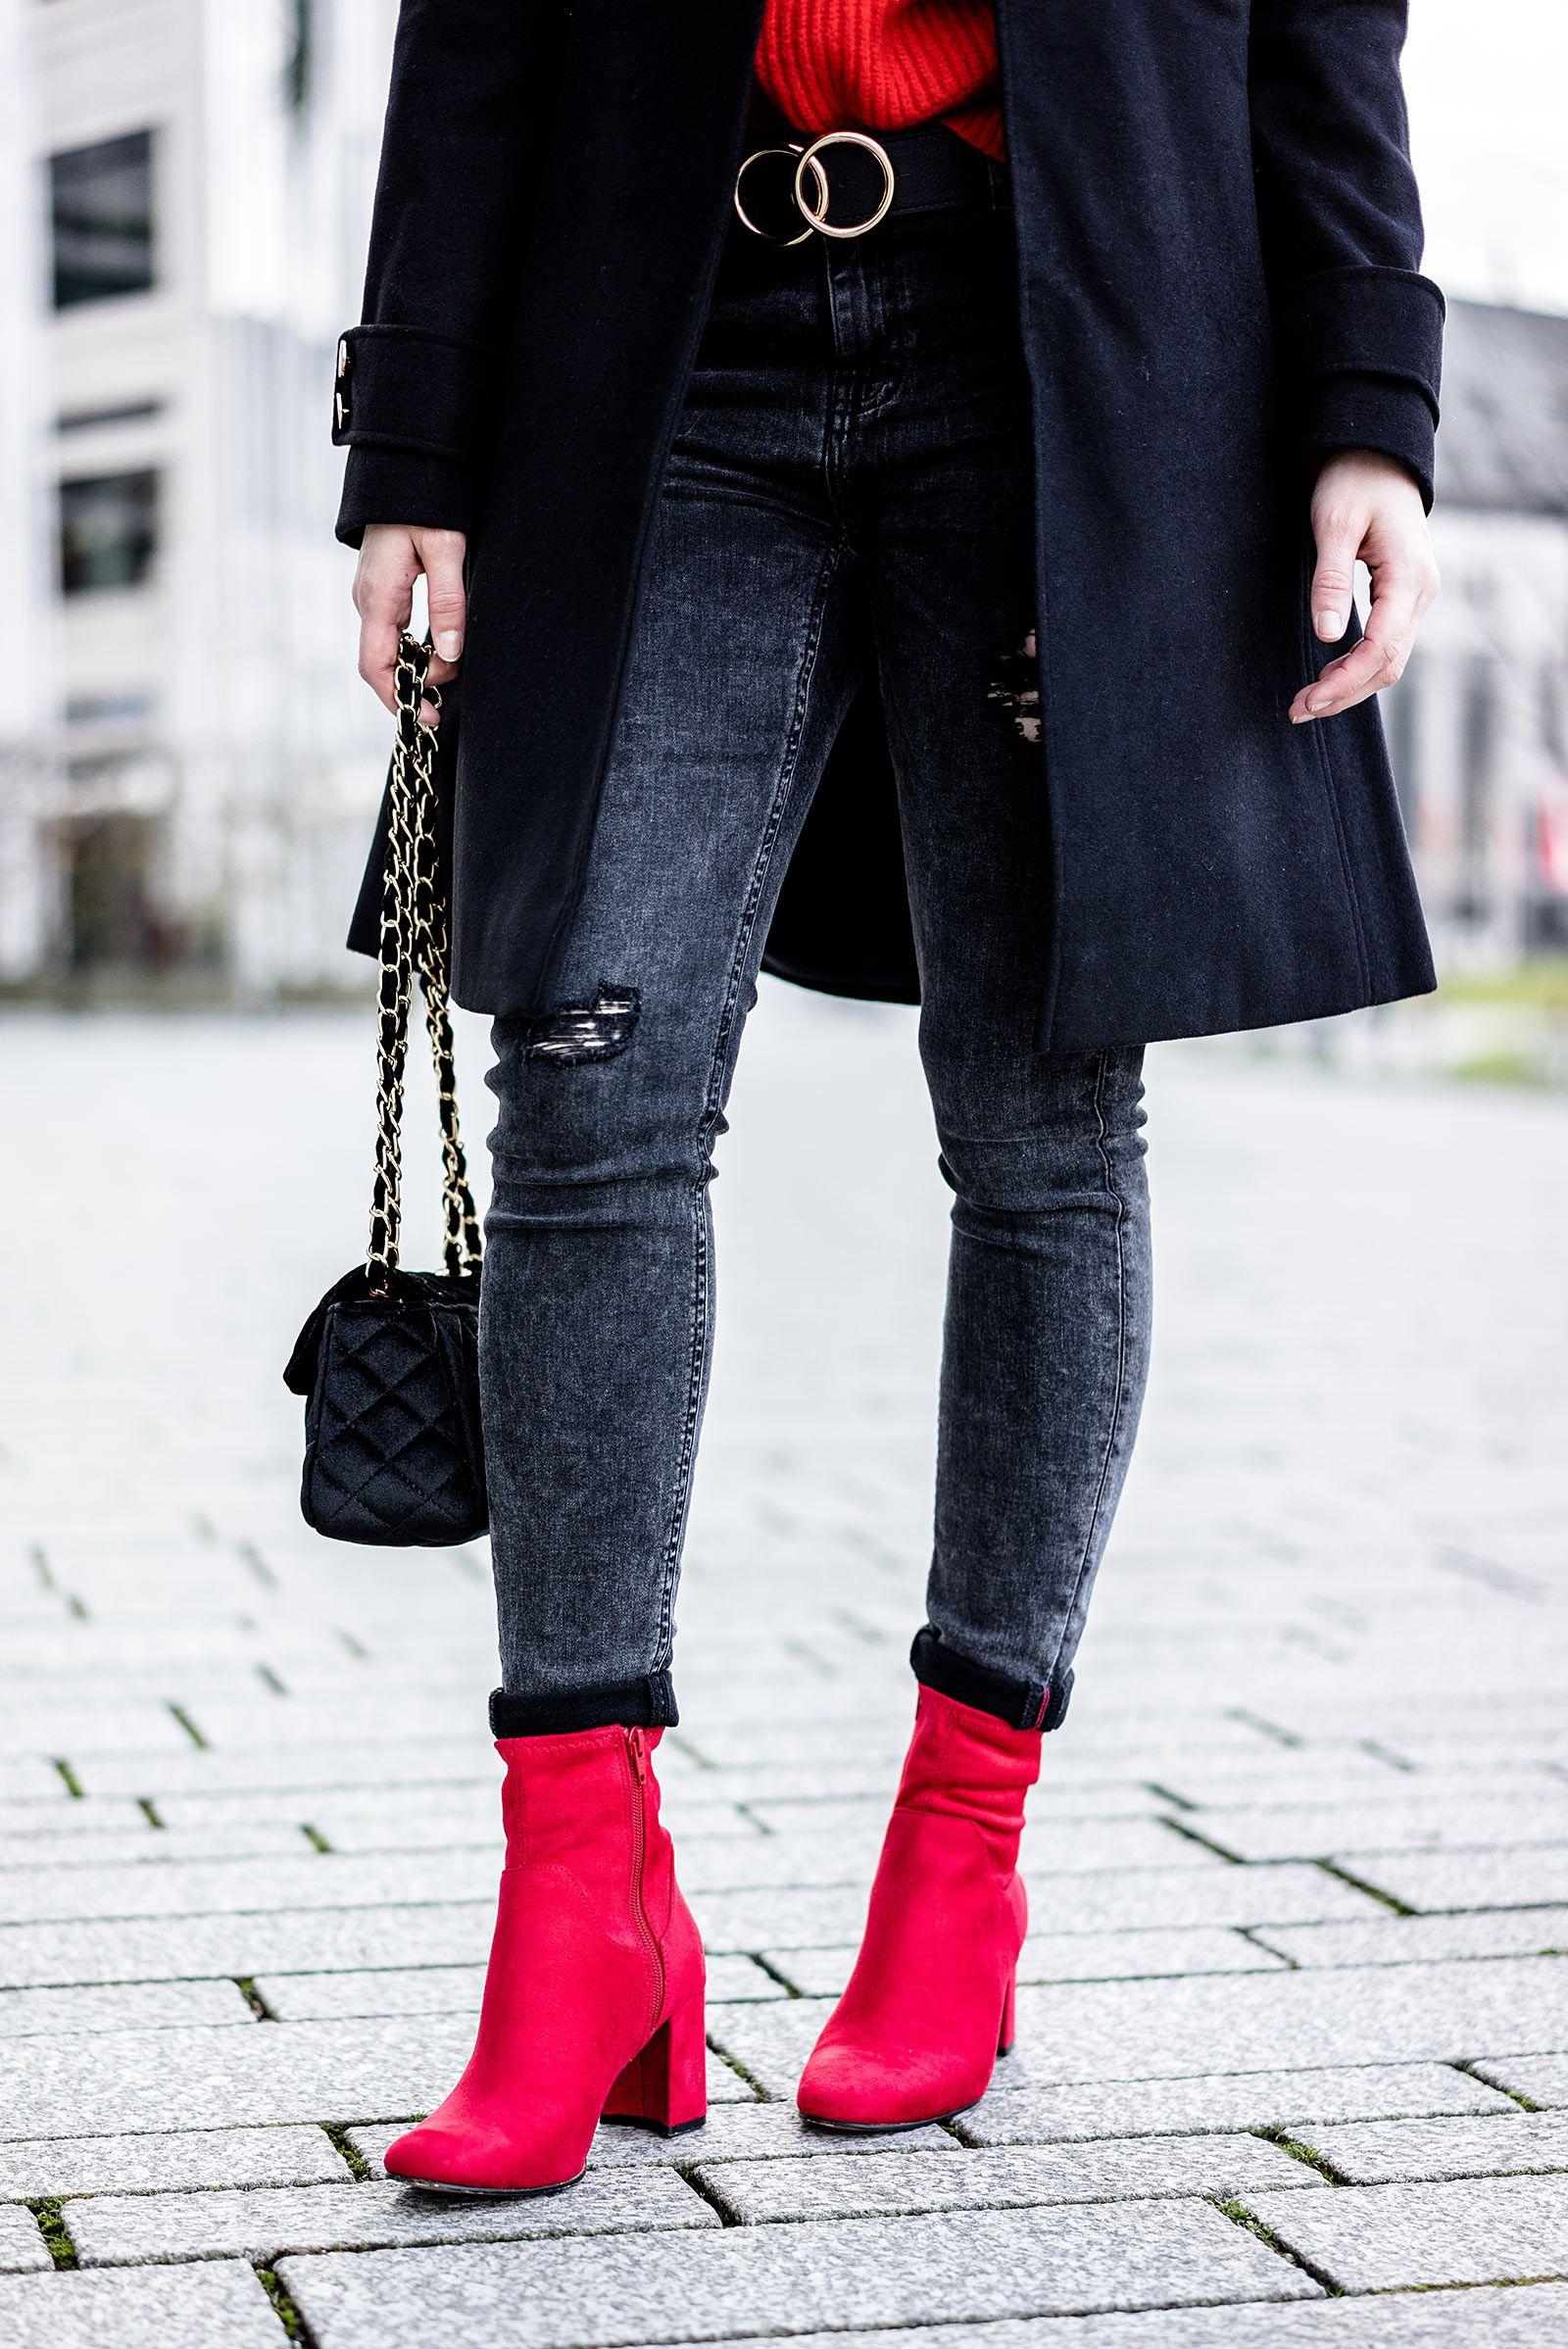 Rote schuhe kombinieren mann